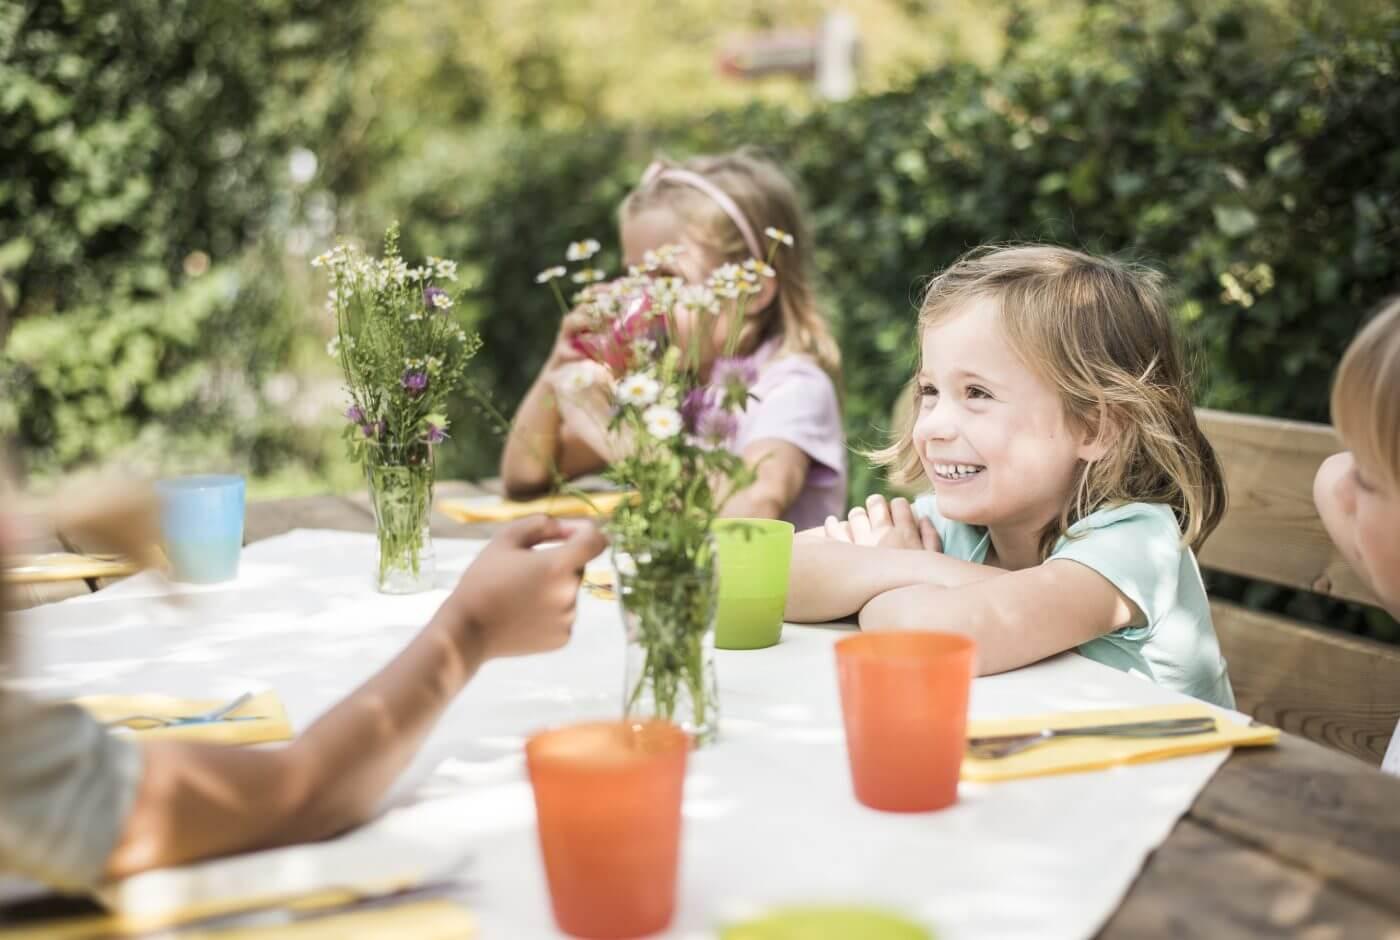 Kinder, Feier, Essen